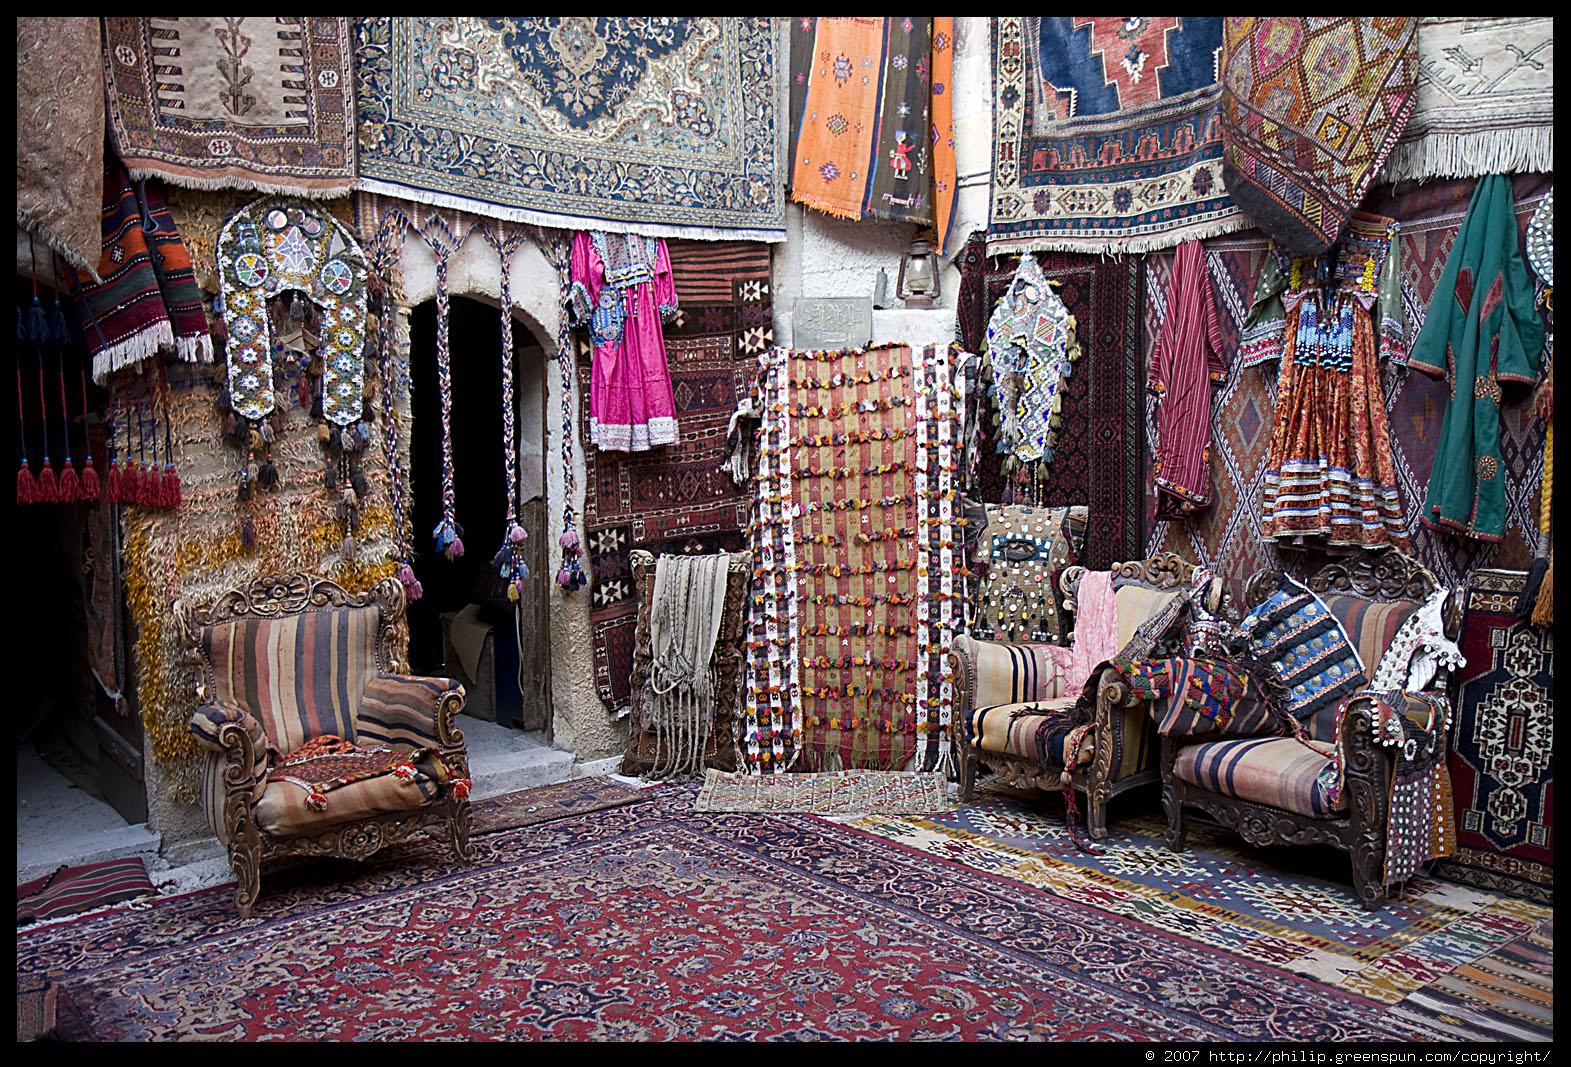 Photograph By Philip Greenspun Carpet Shop Courtyard